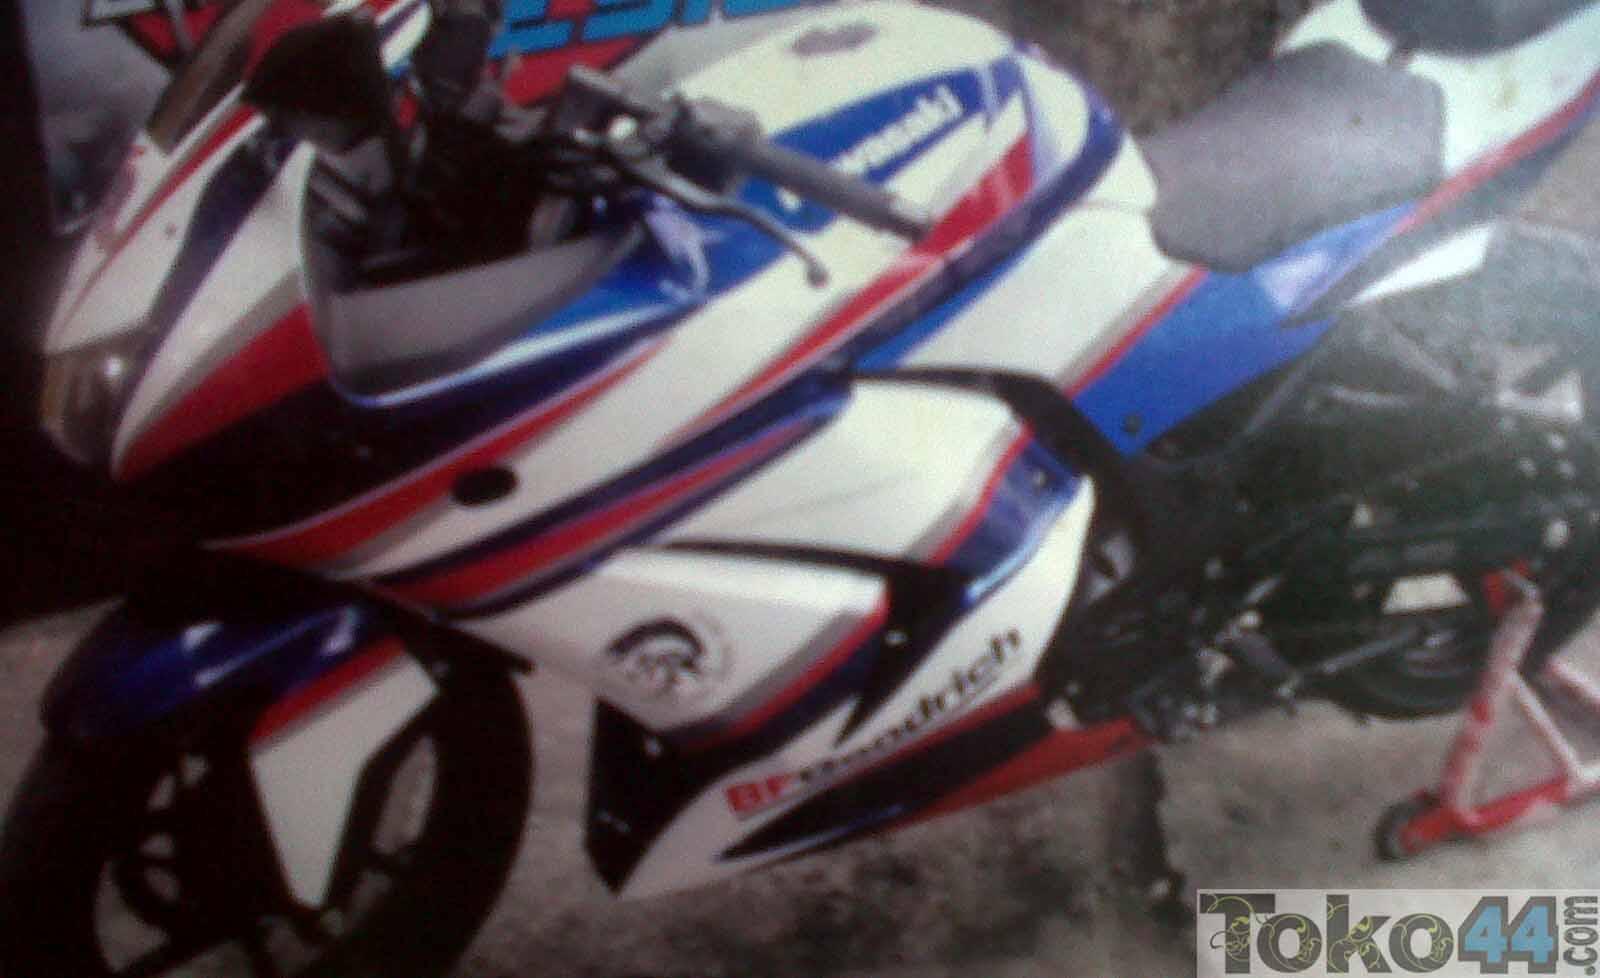 Desain Stiker Motor Kawasaki Ninja 250 title=